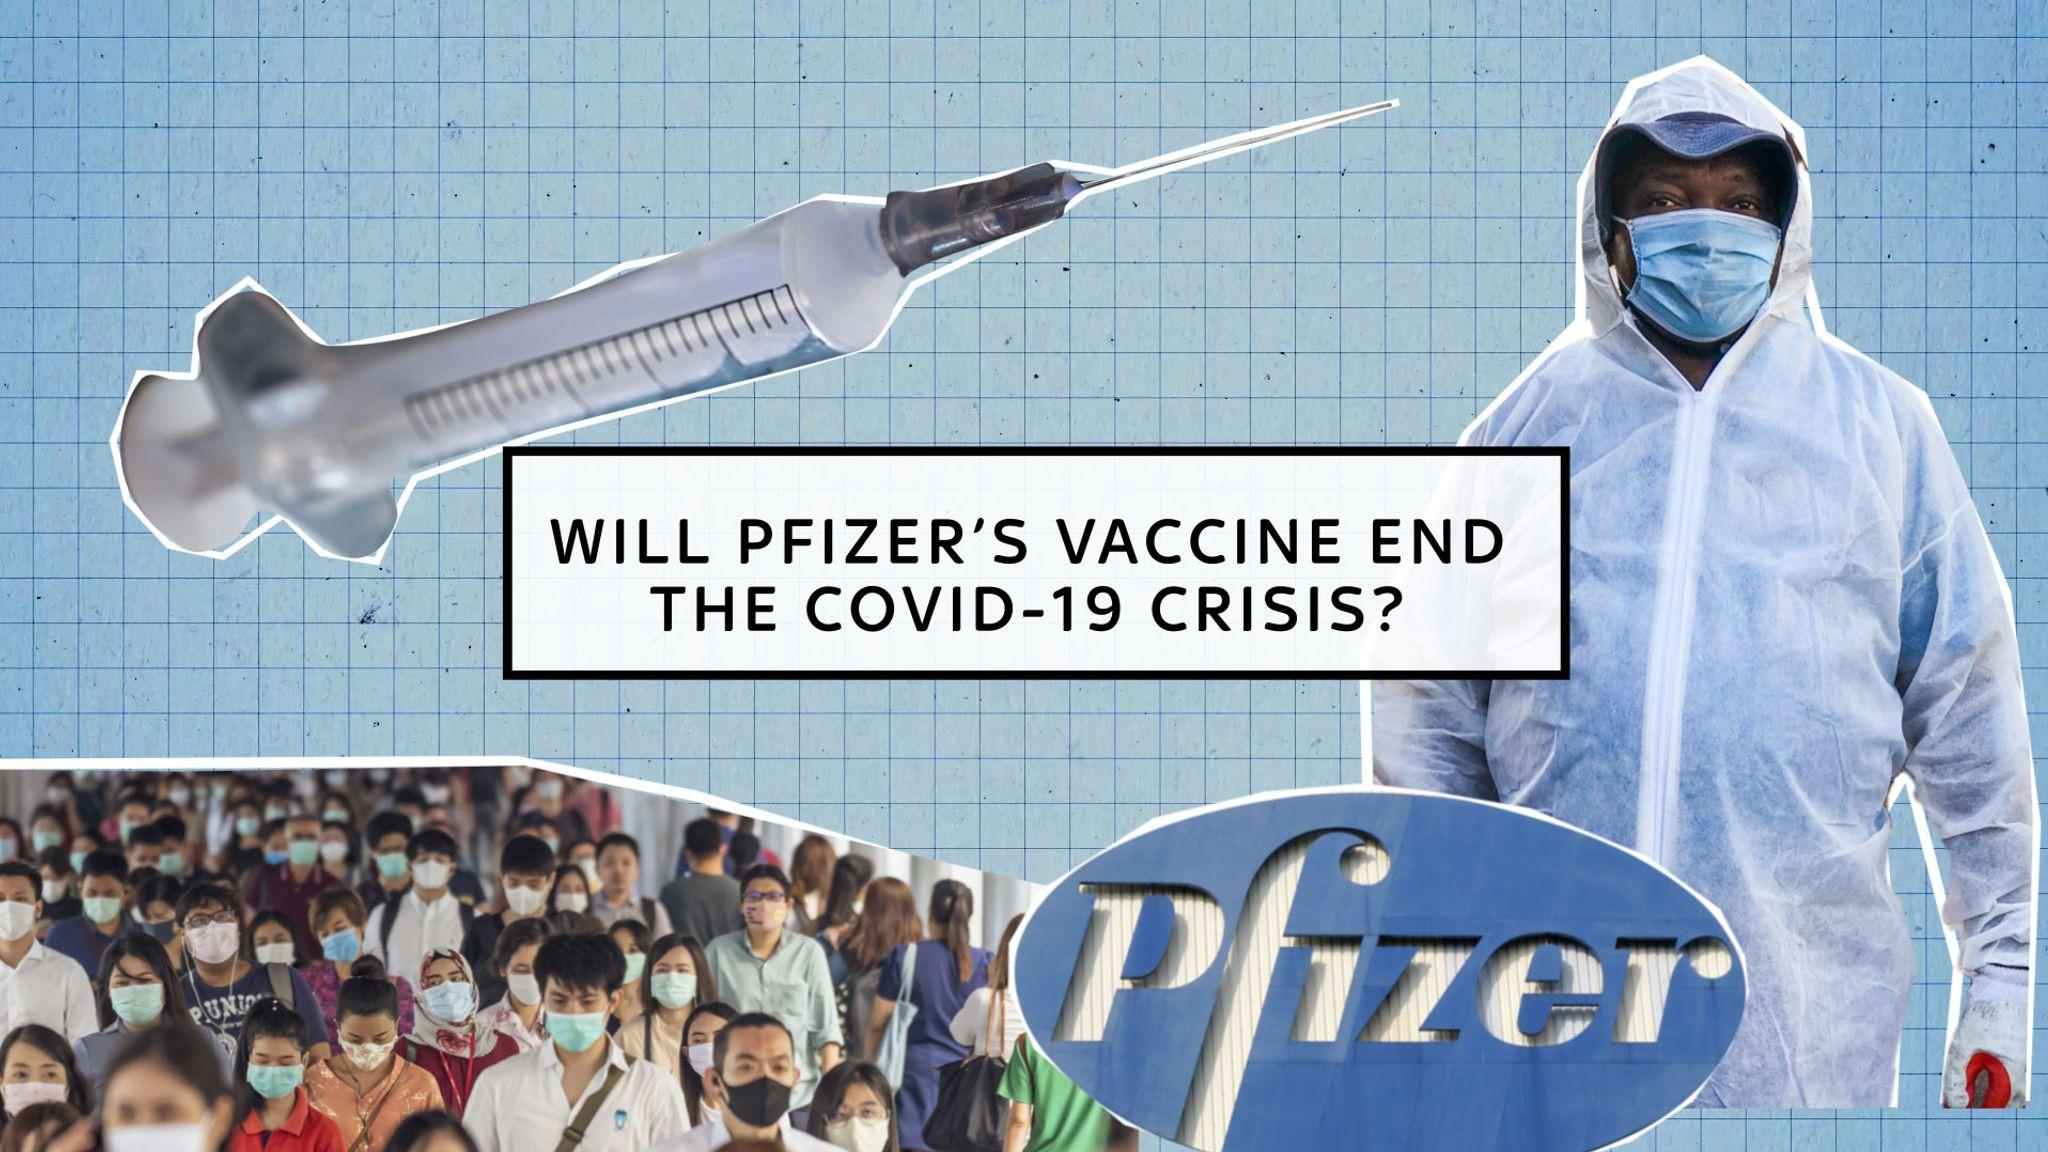 Coronavirus: Will the Pfizer and BioNTech vaccine end the crisis?   World  News   Sky News